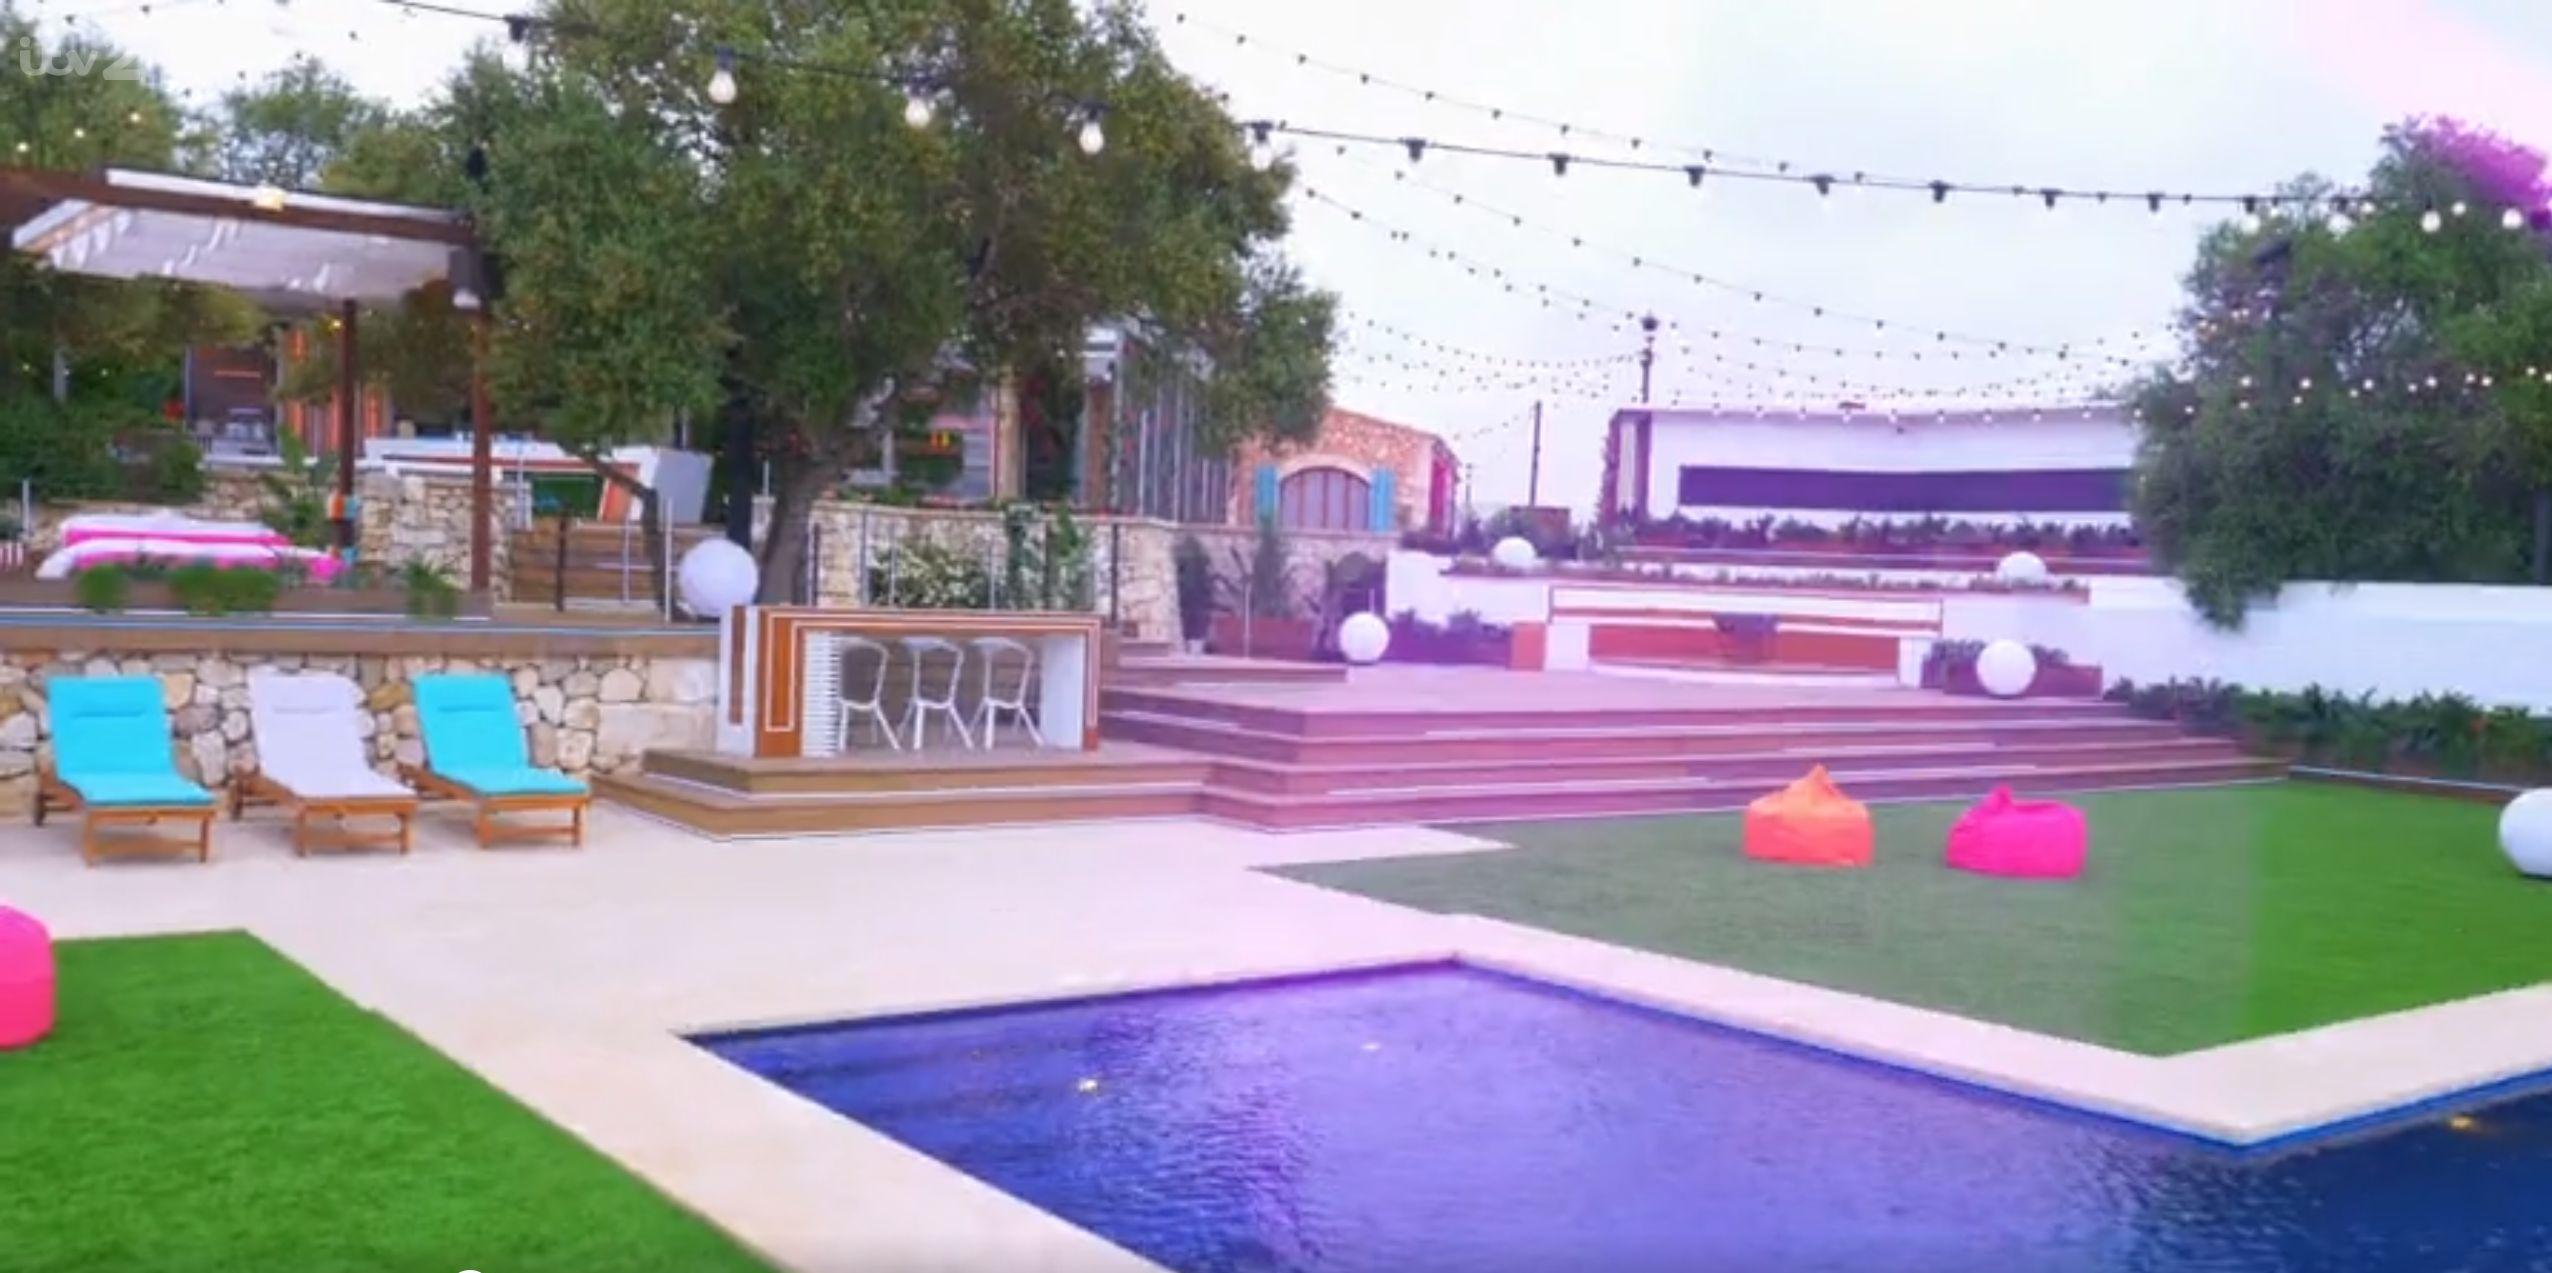 Image may contain: Yard, Outdoors, Backyard, Water, Pool, Balcony